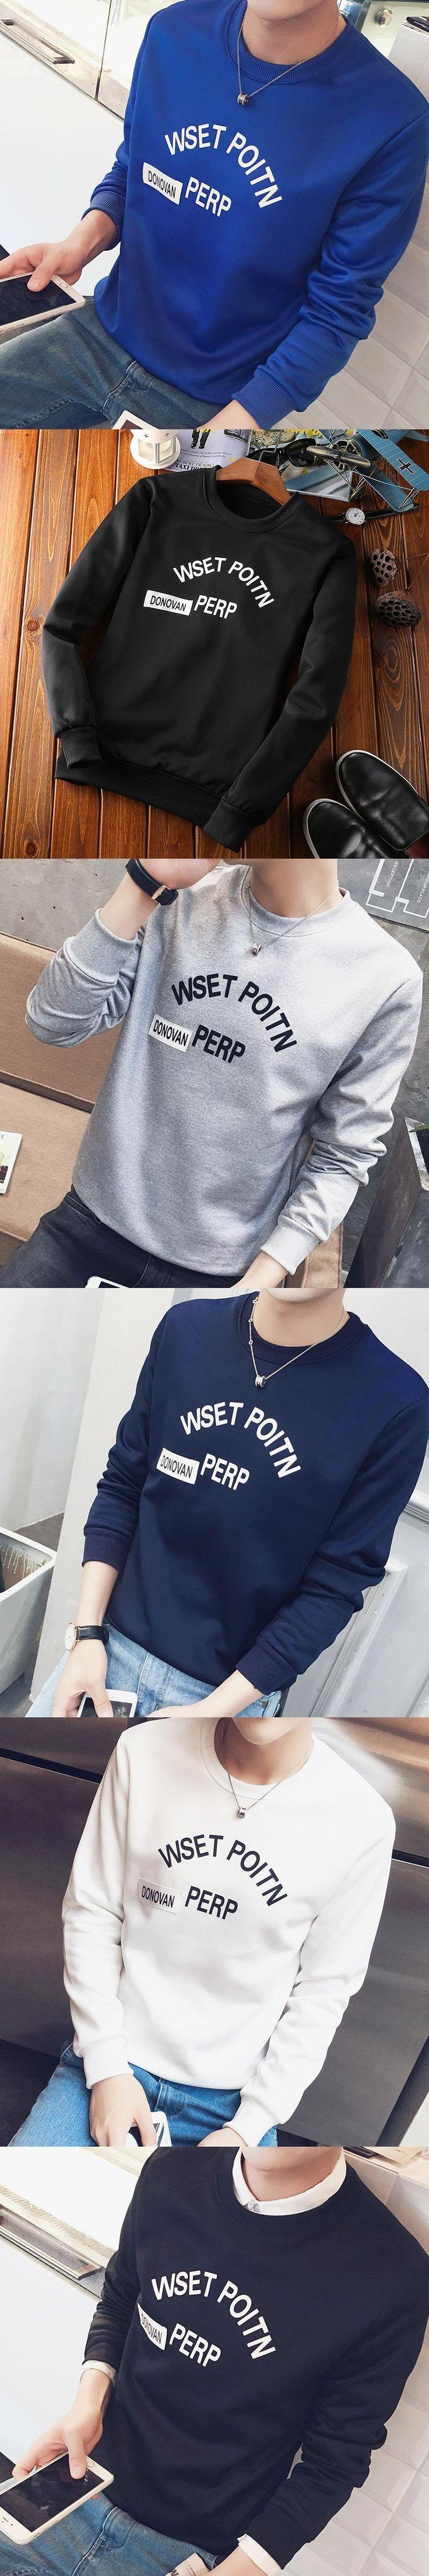 2017 Spring Slim Cut Sweatshirt Men Casual Print Pullover Basic Tops Fashion O-neck Sweatshirt for Boys